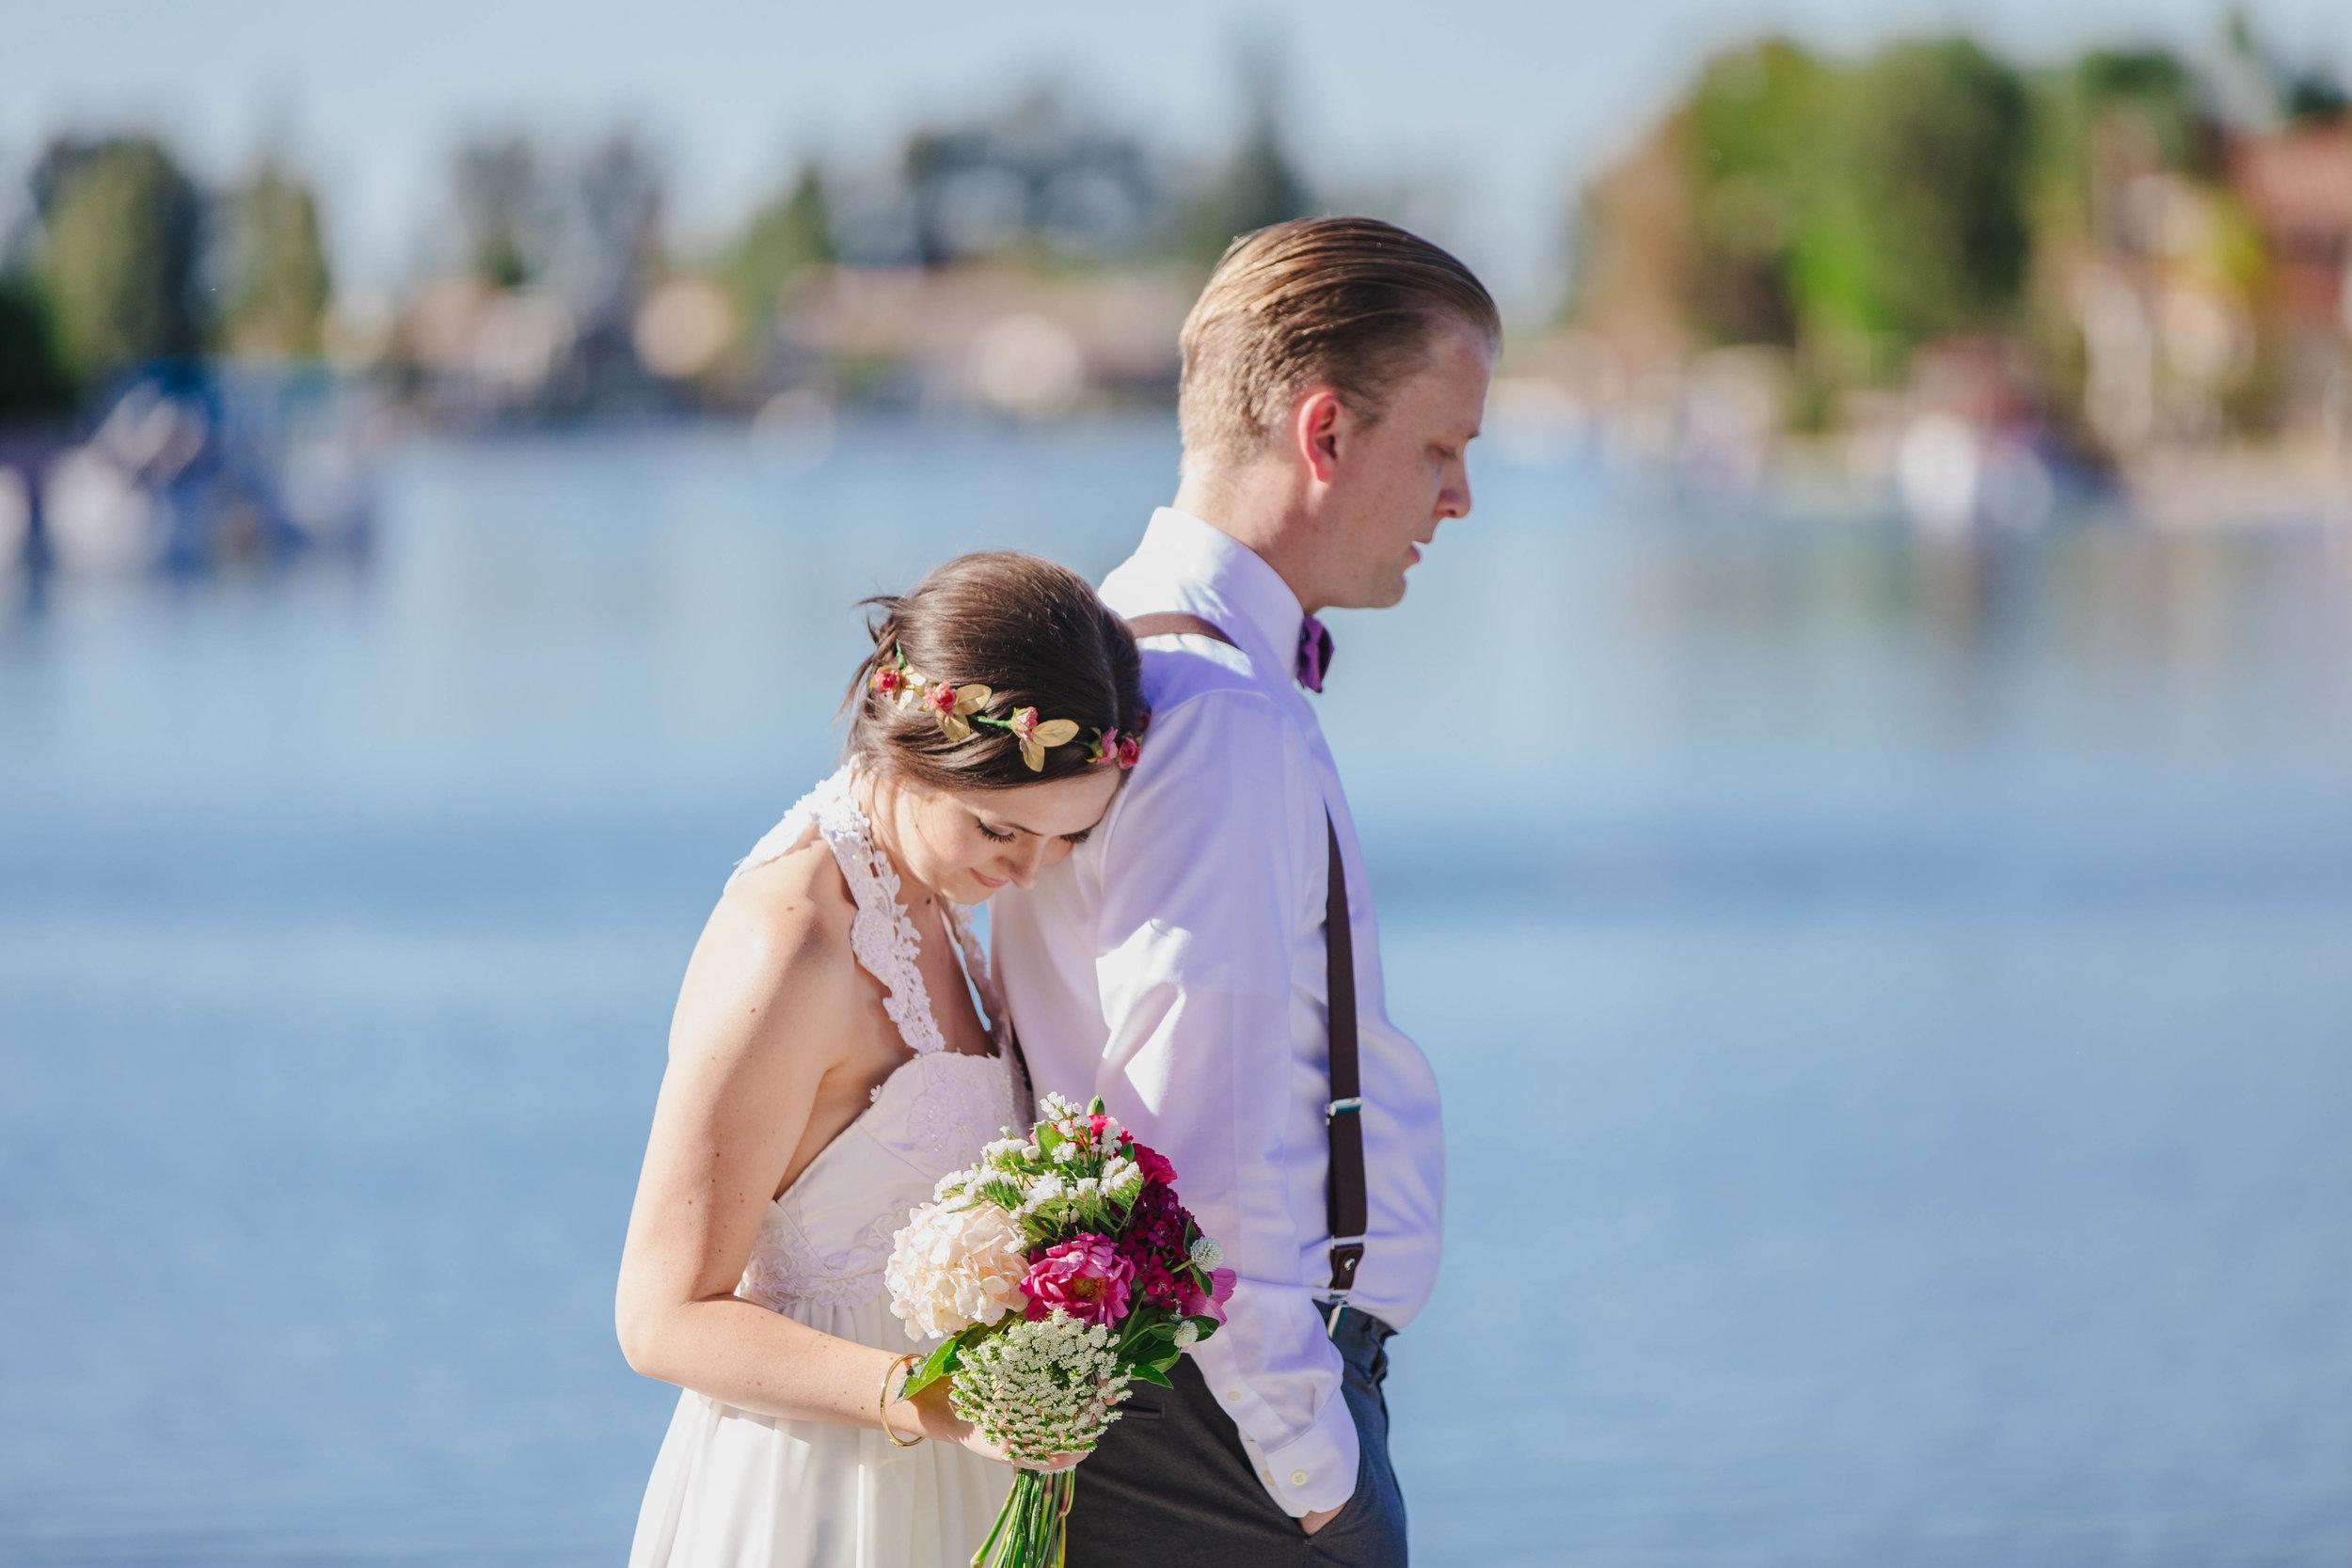 20141024-DePartee-Wedding-APavone-024-sm.jpg